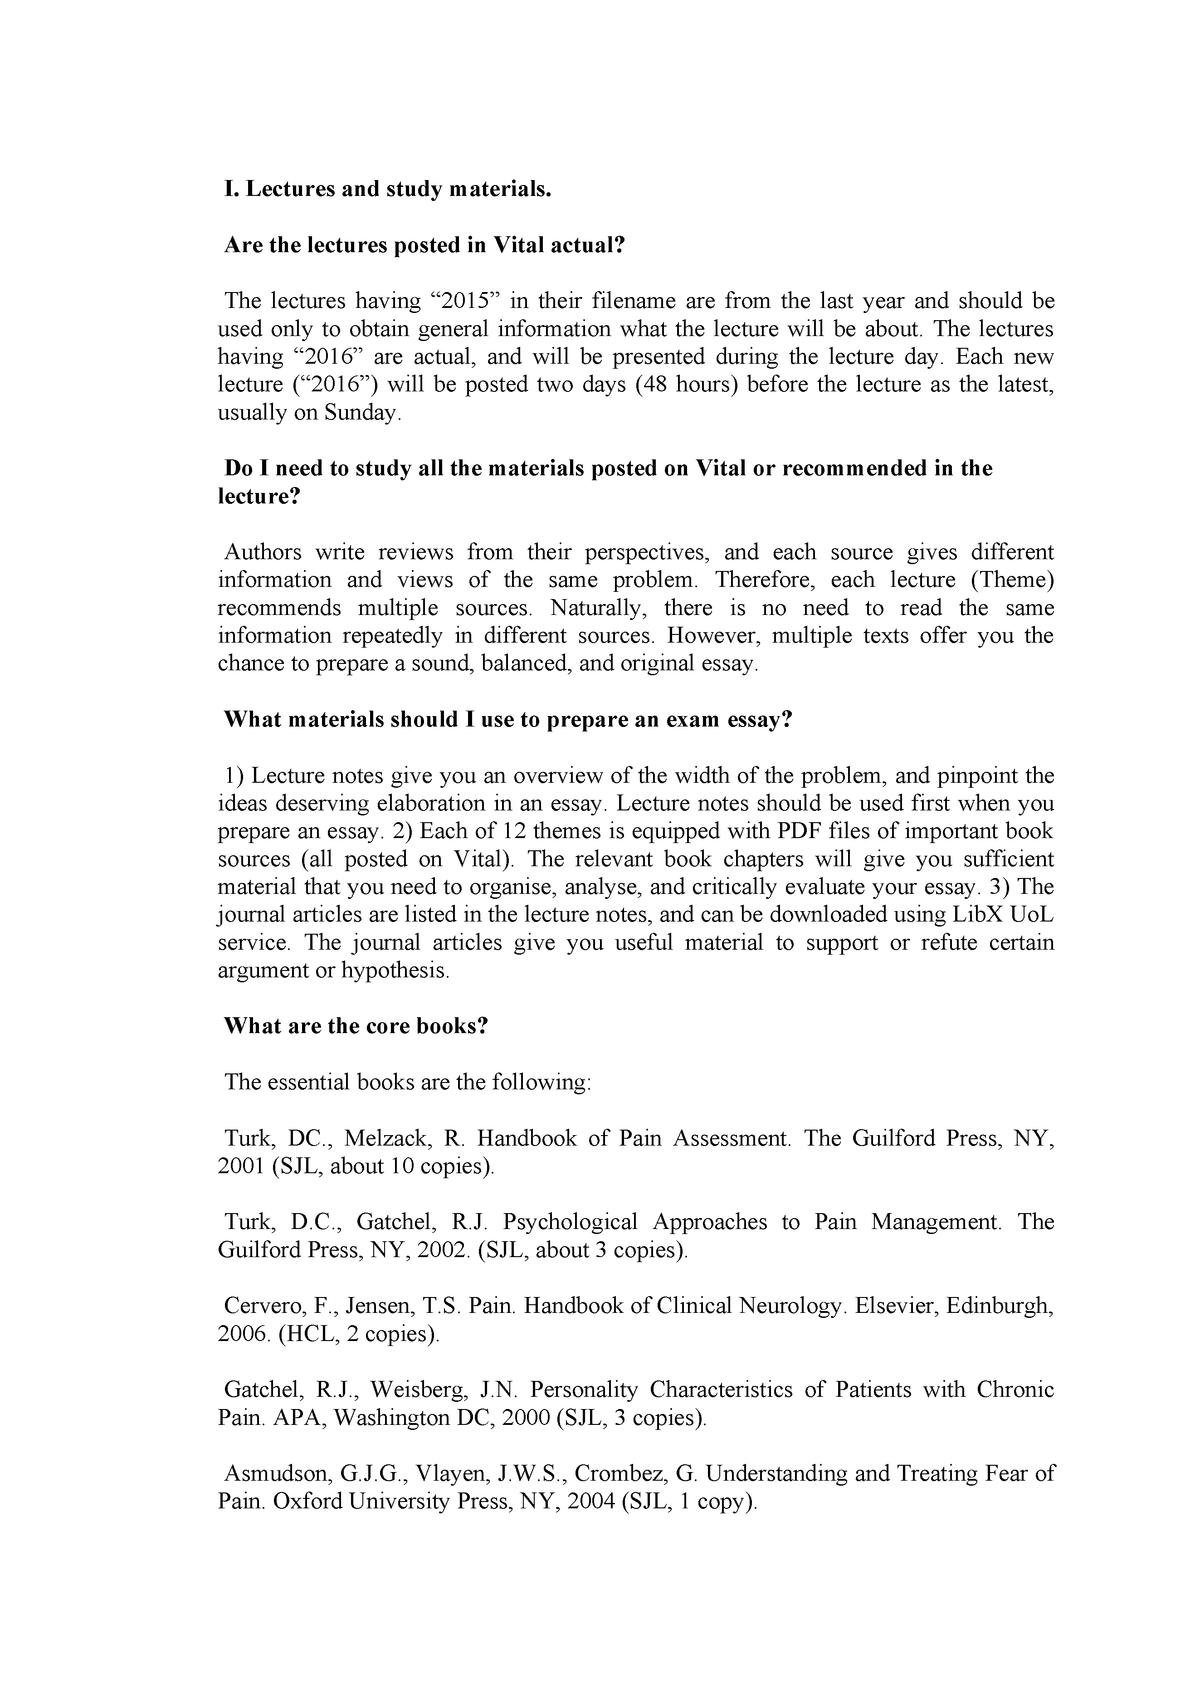 FAQ - FAQ about the module topics - PSYC317: Psychobiology of Pain